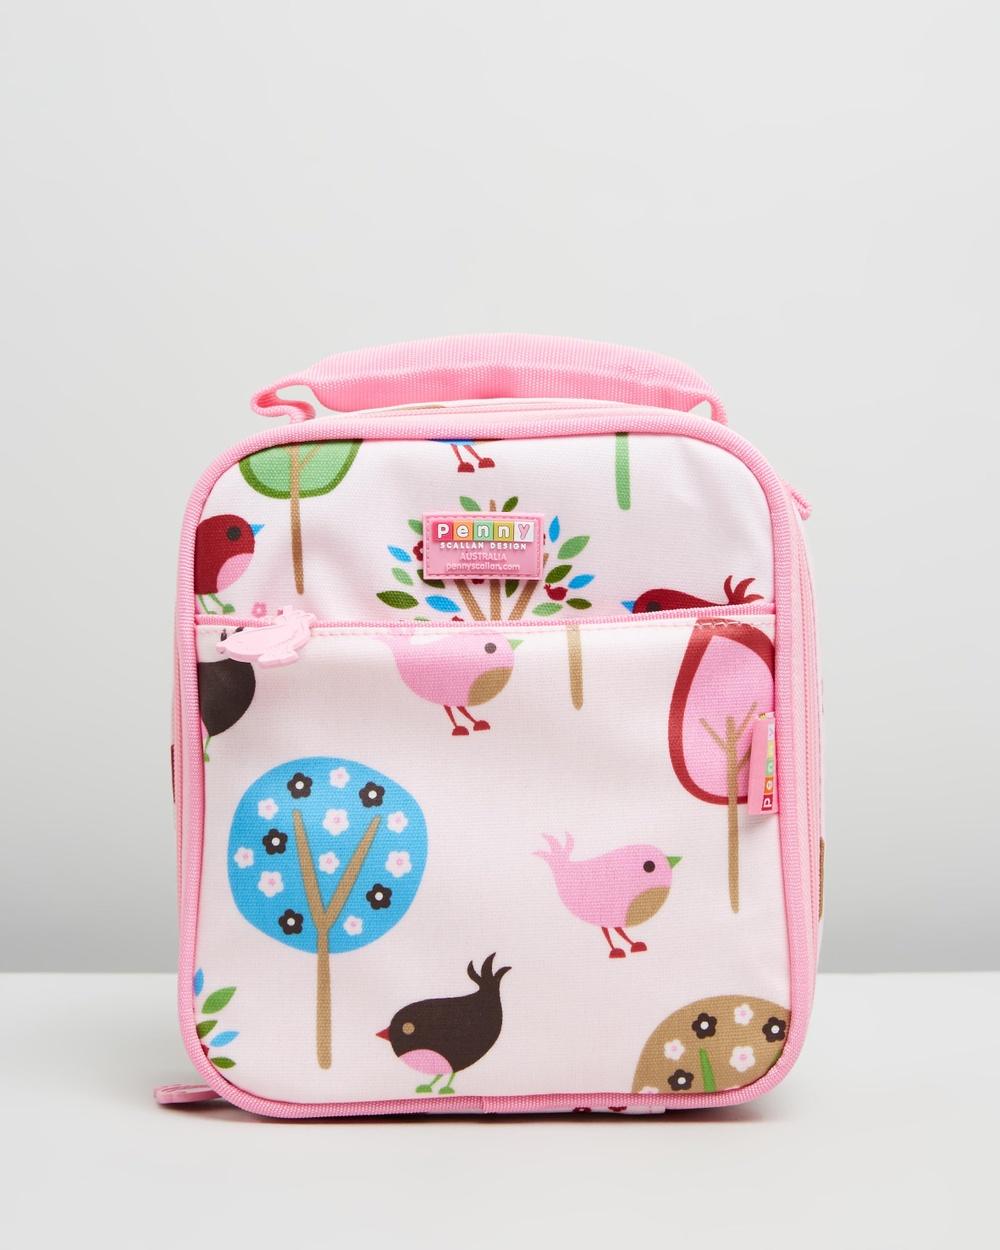 Penny Scallan Lunchbox School Home Chirpy Bird